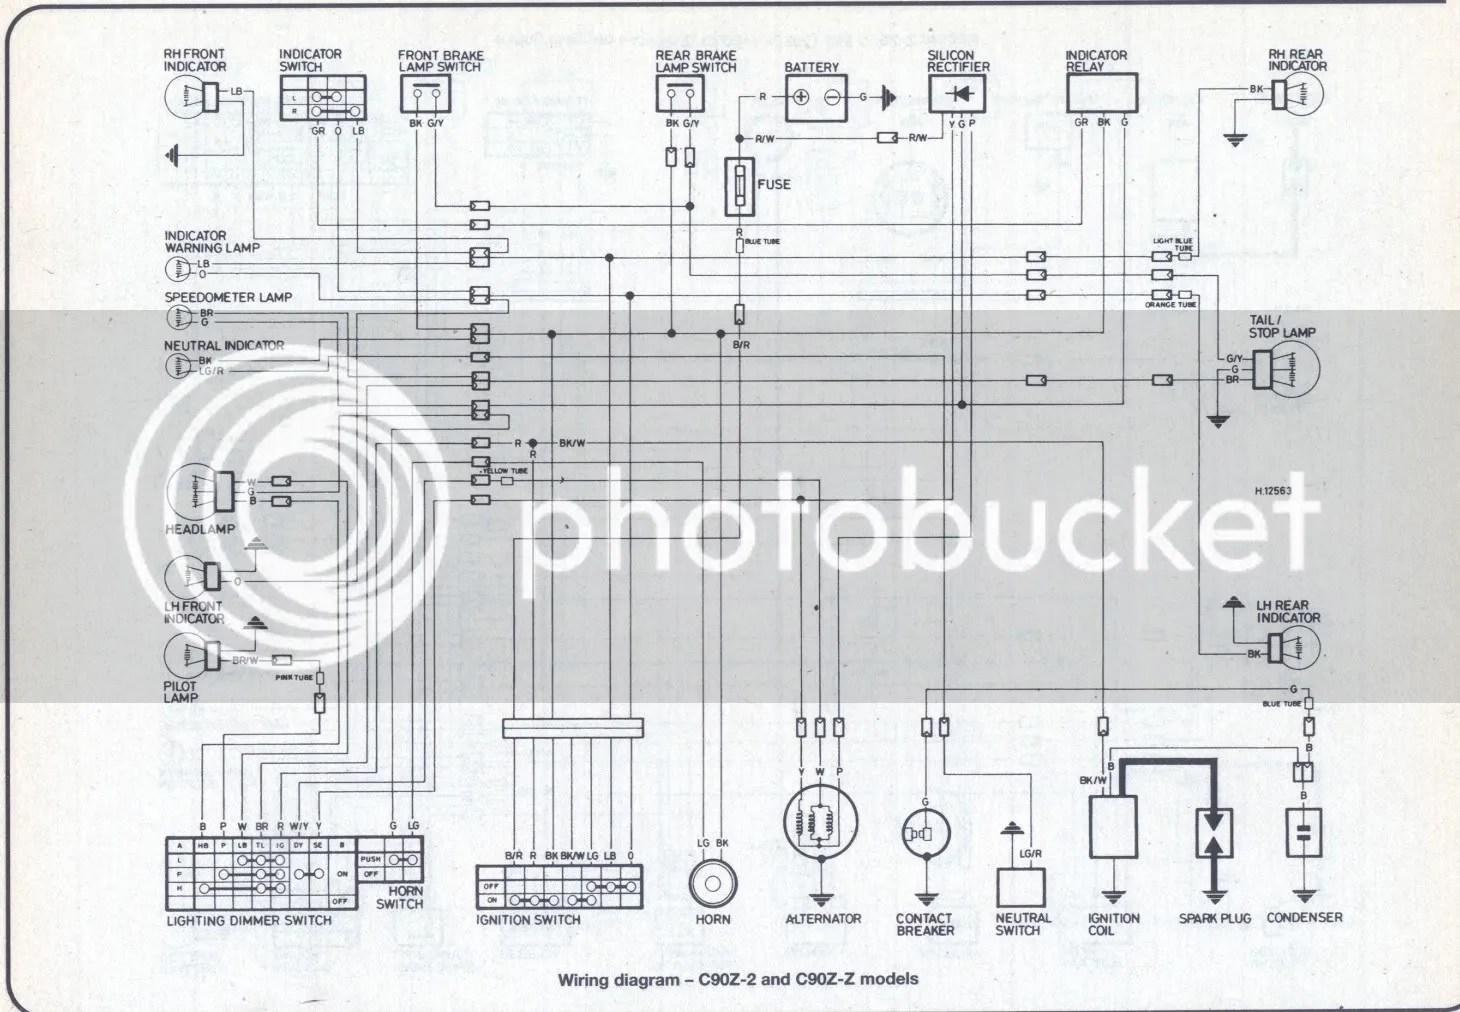 western golf cart 42 volt wiring diagram cobra car alarm system get free